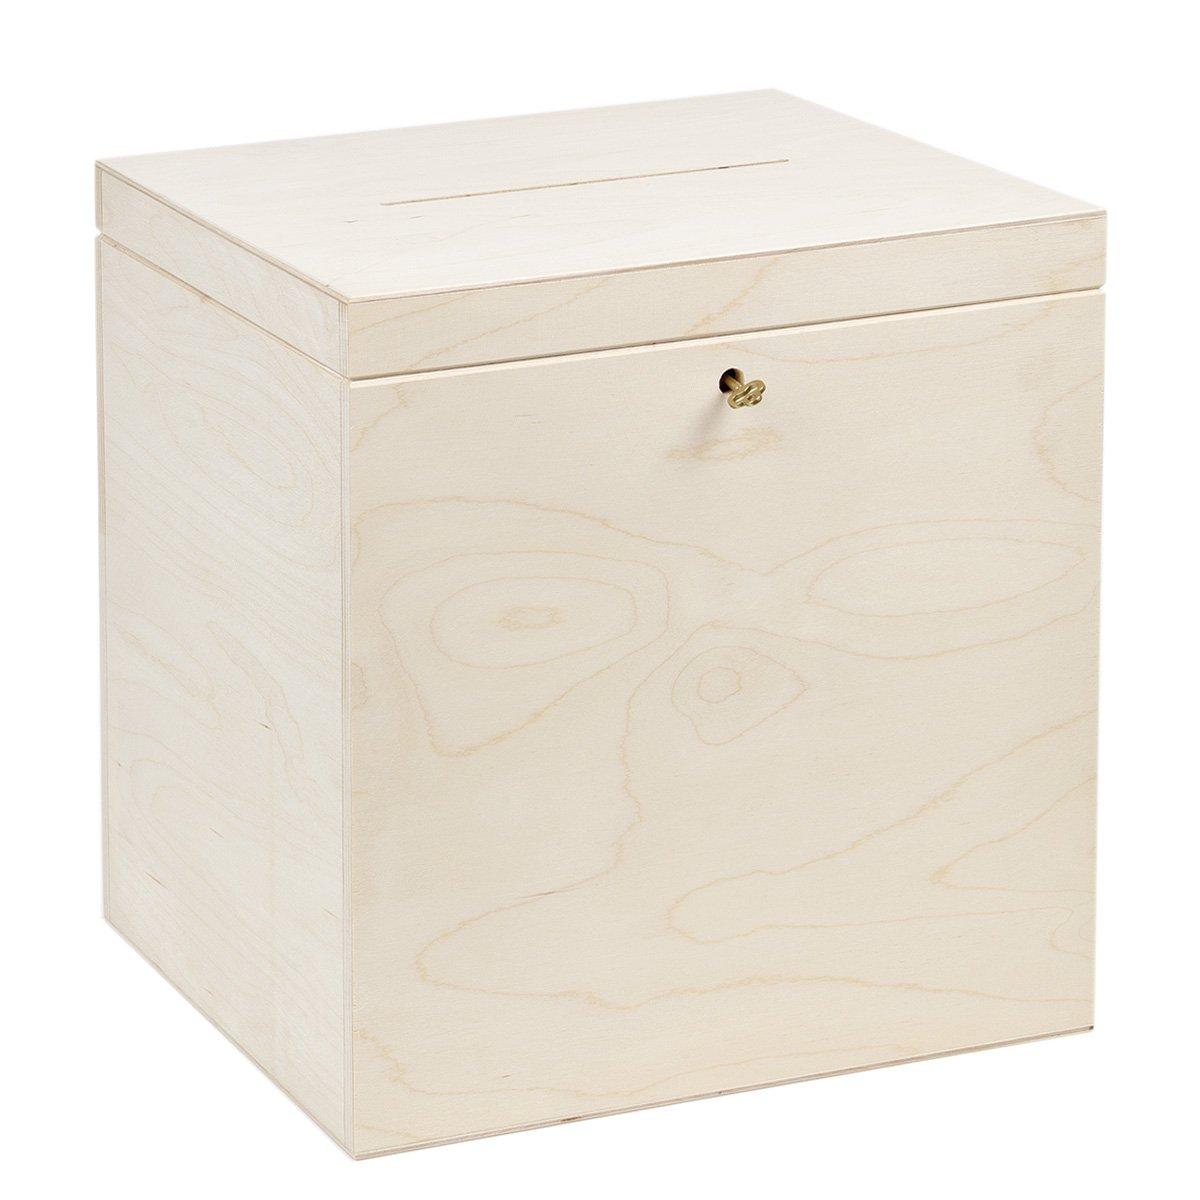 Caja de madera para regalo, 25 x 29 x 30 cm, caja para tarjetas, caja para bodas: Amazon.es: Hogar